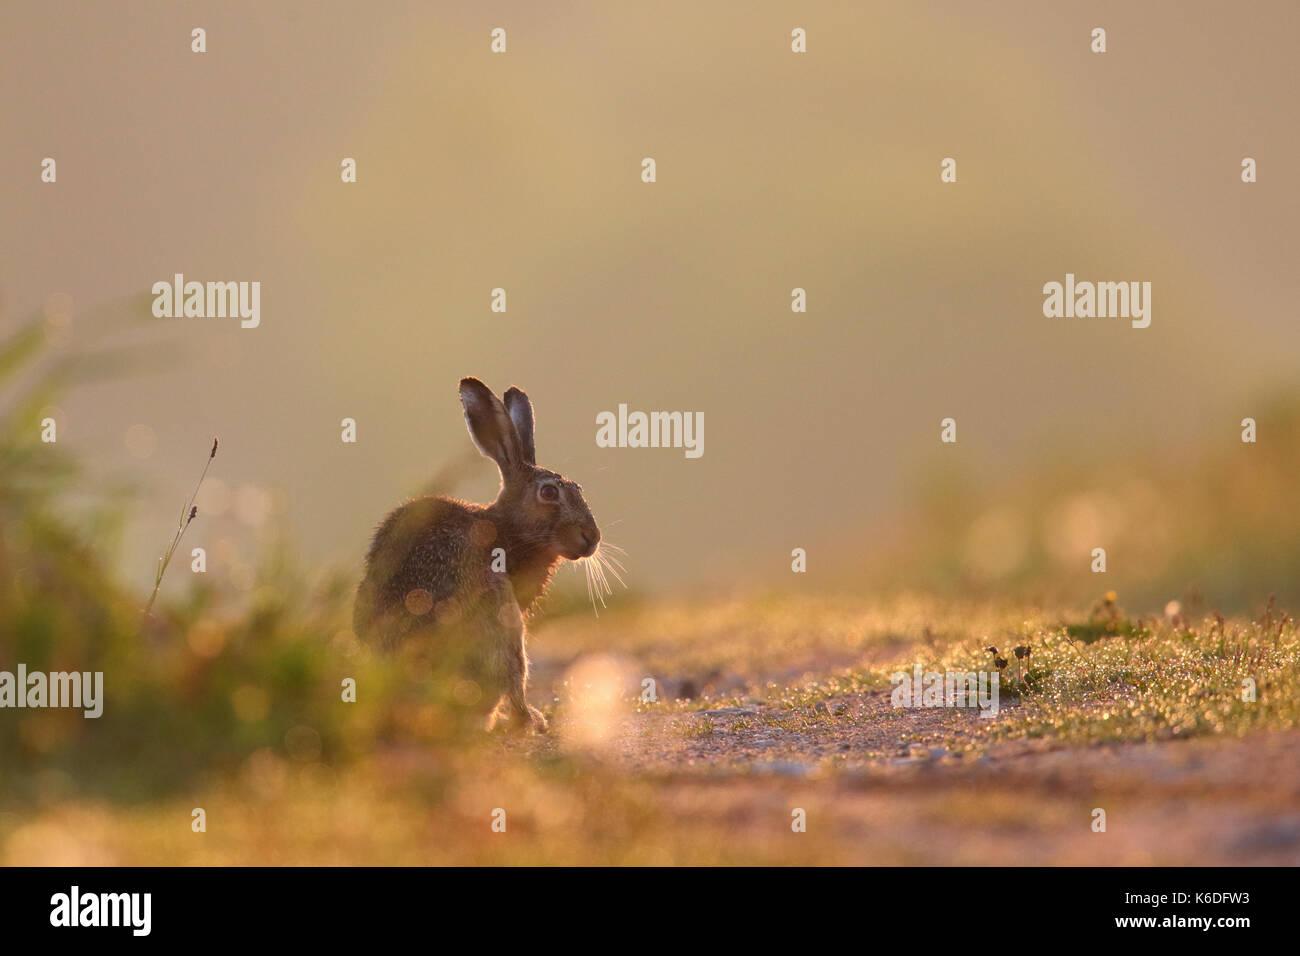 Europäische Feldhase (Lepus europaeus) in den frühen Morgenstunden. Europa Stockbild